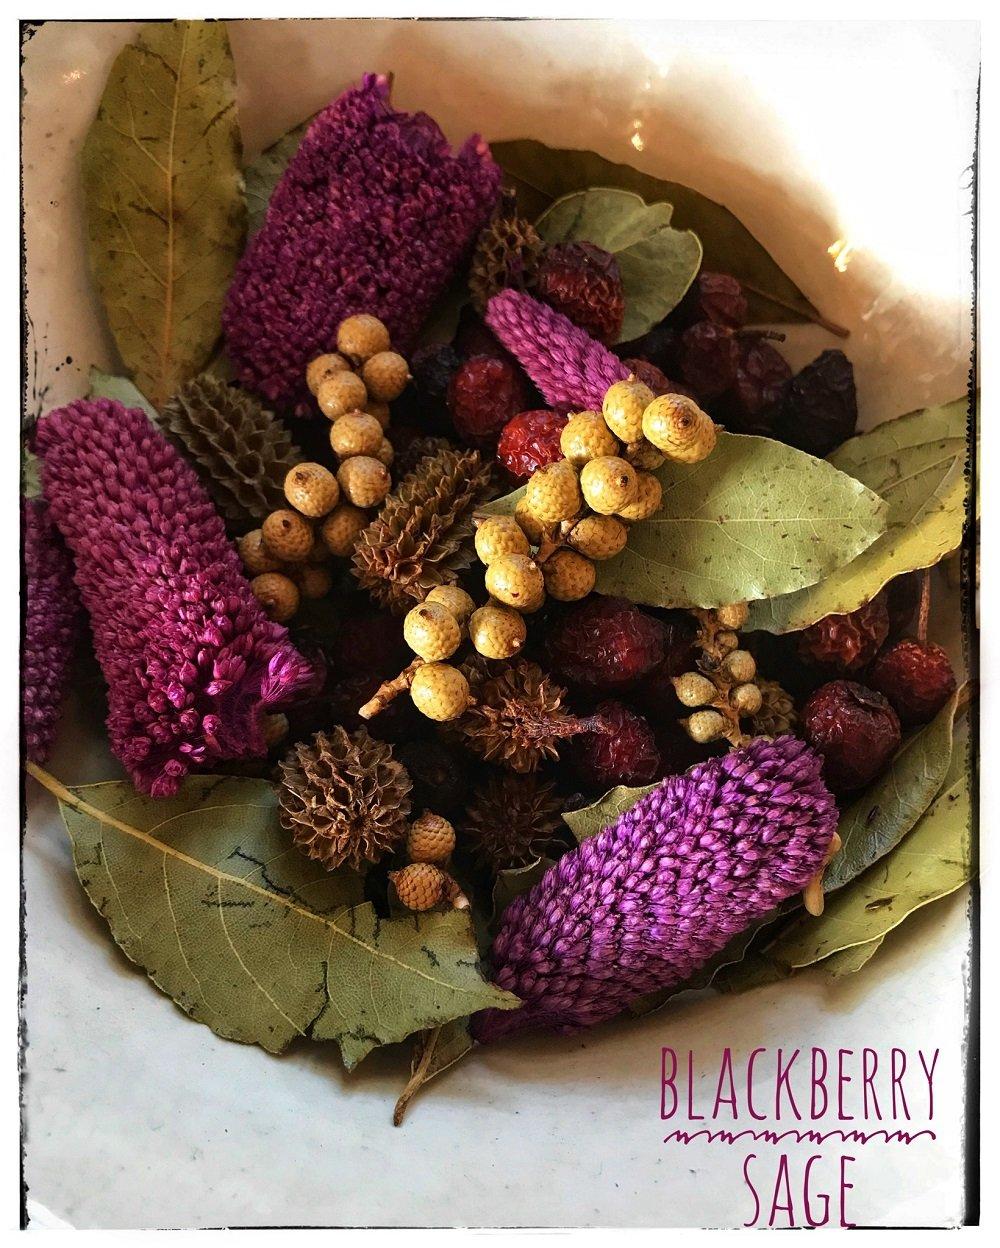 Homestead Studios - Blackberry Sage Potpourri - Perfect Potpourri for all year round